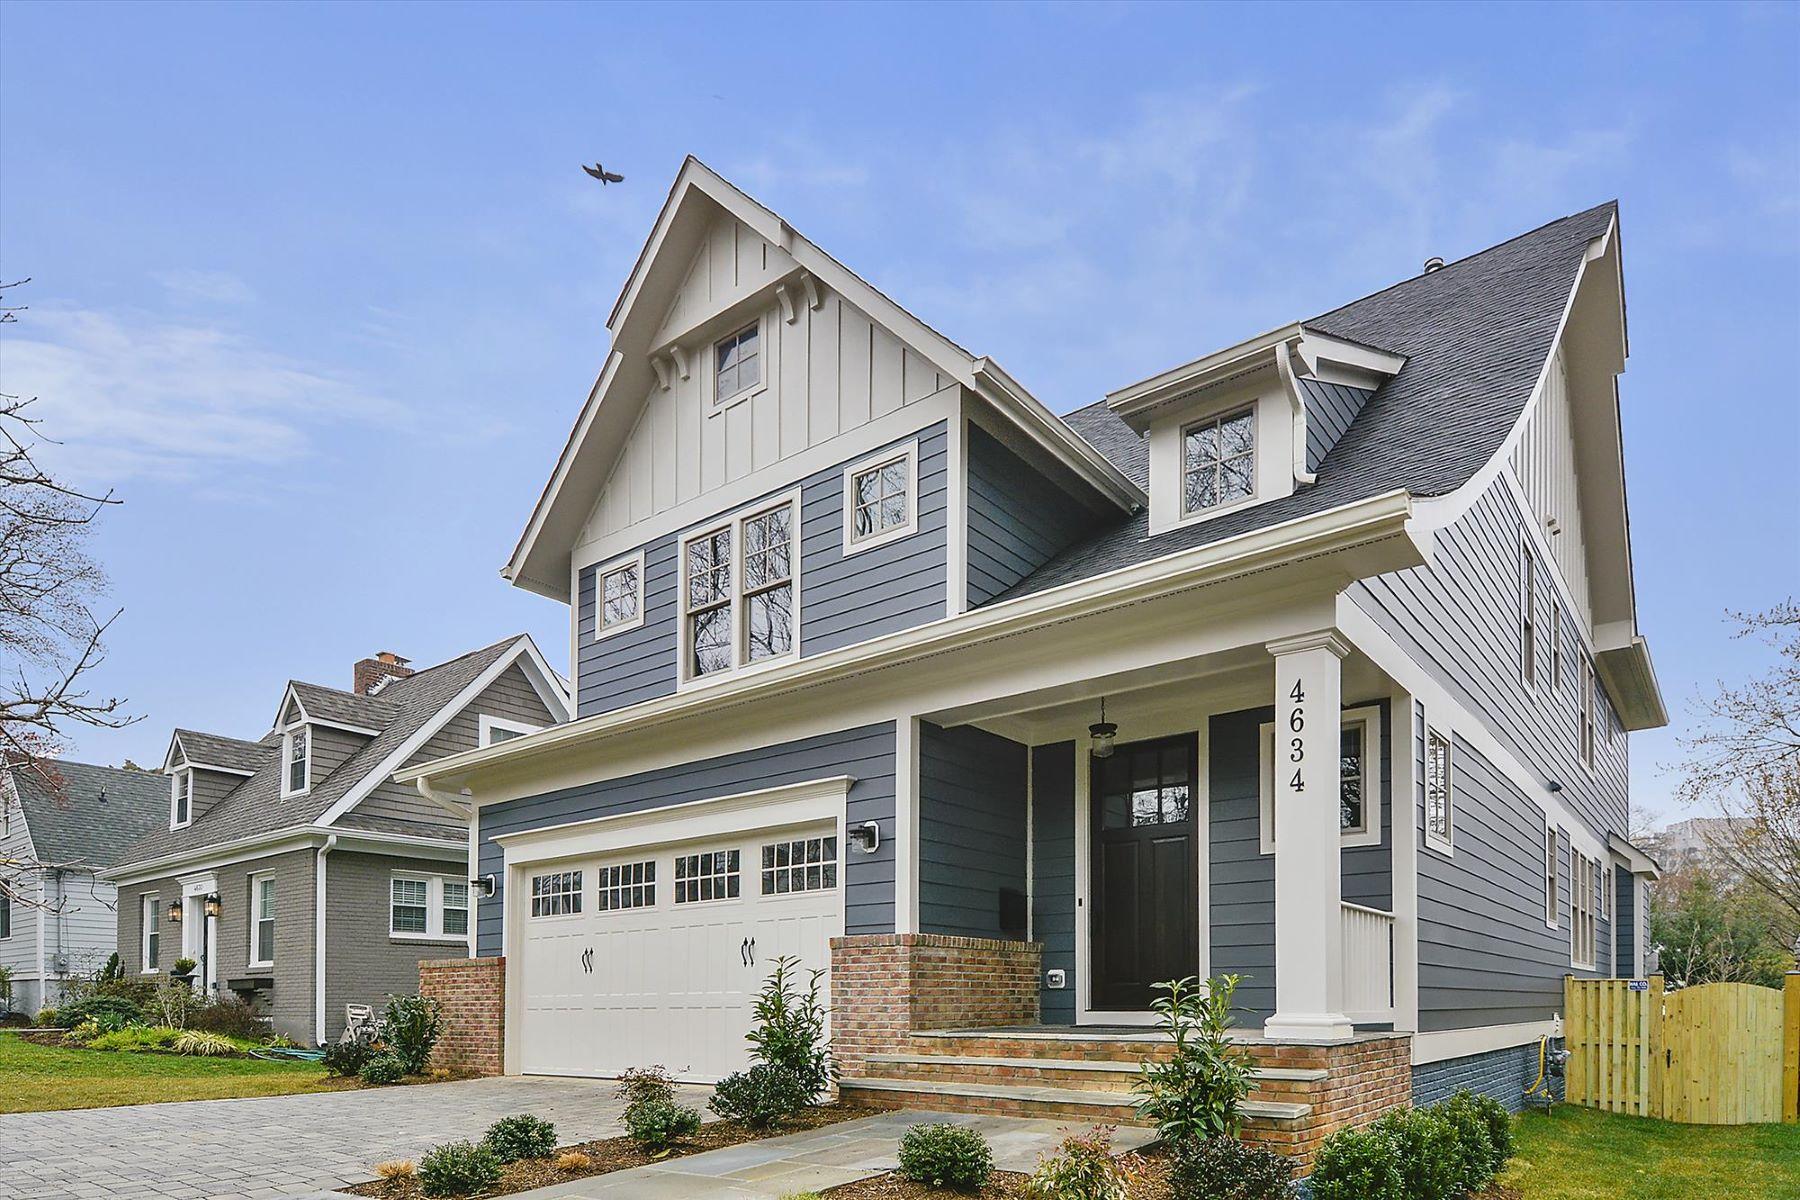 Single Family Homes для того Продажа на Stunning Home By Springstreet Development 4634 14th St N Arlington, Виргиния 22207 Соединенные Штаты